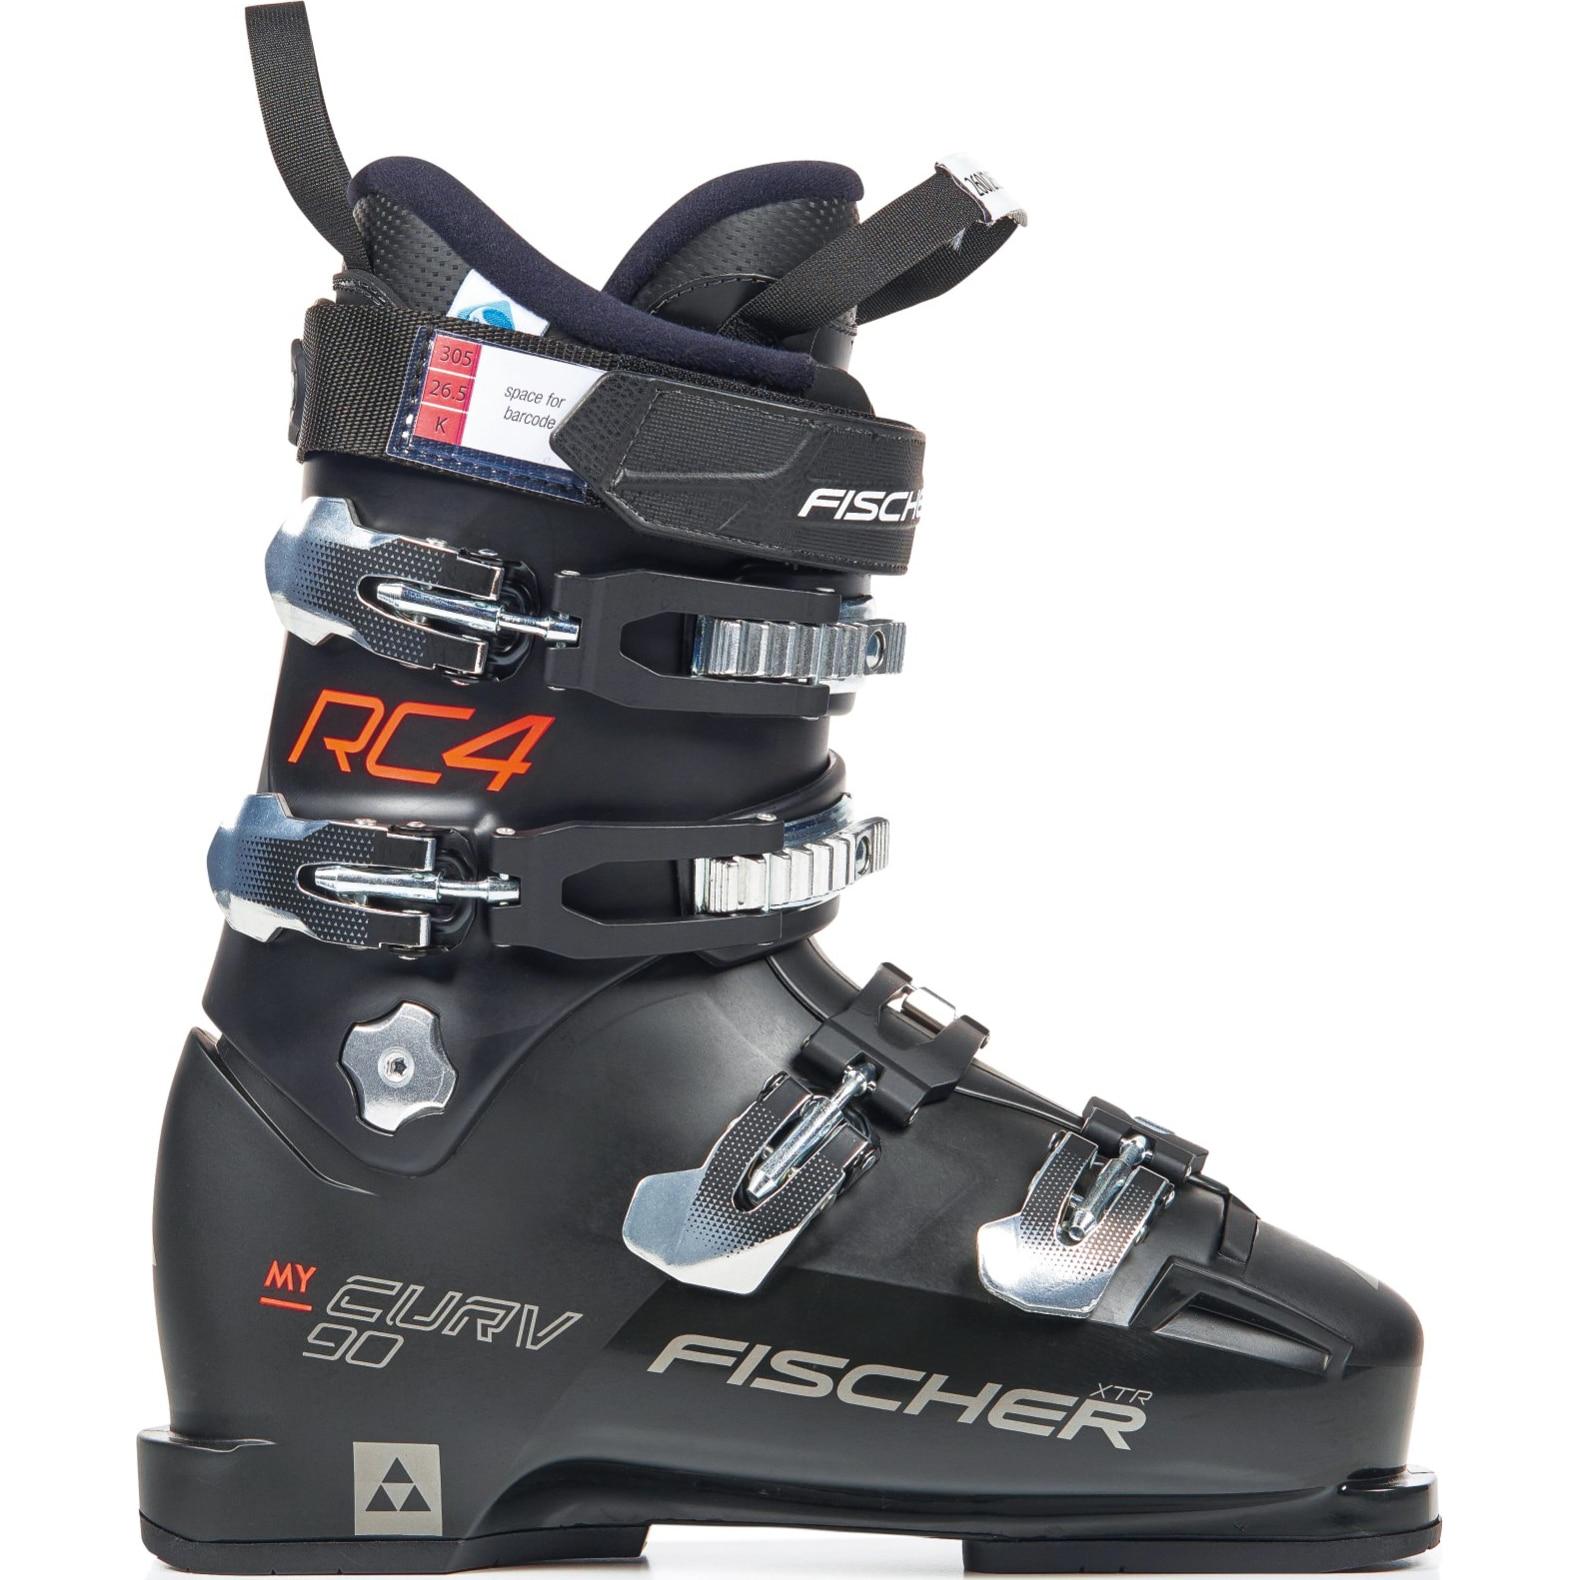 Fotografie Clapari ski Fischer MY Curv XTR 90, Negru, 27.5